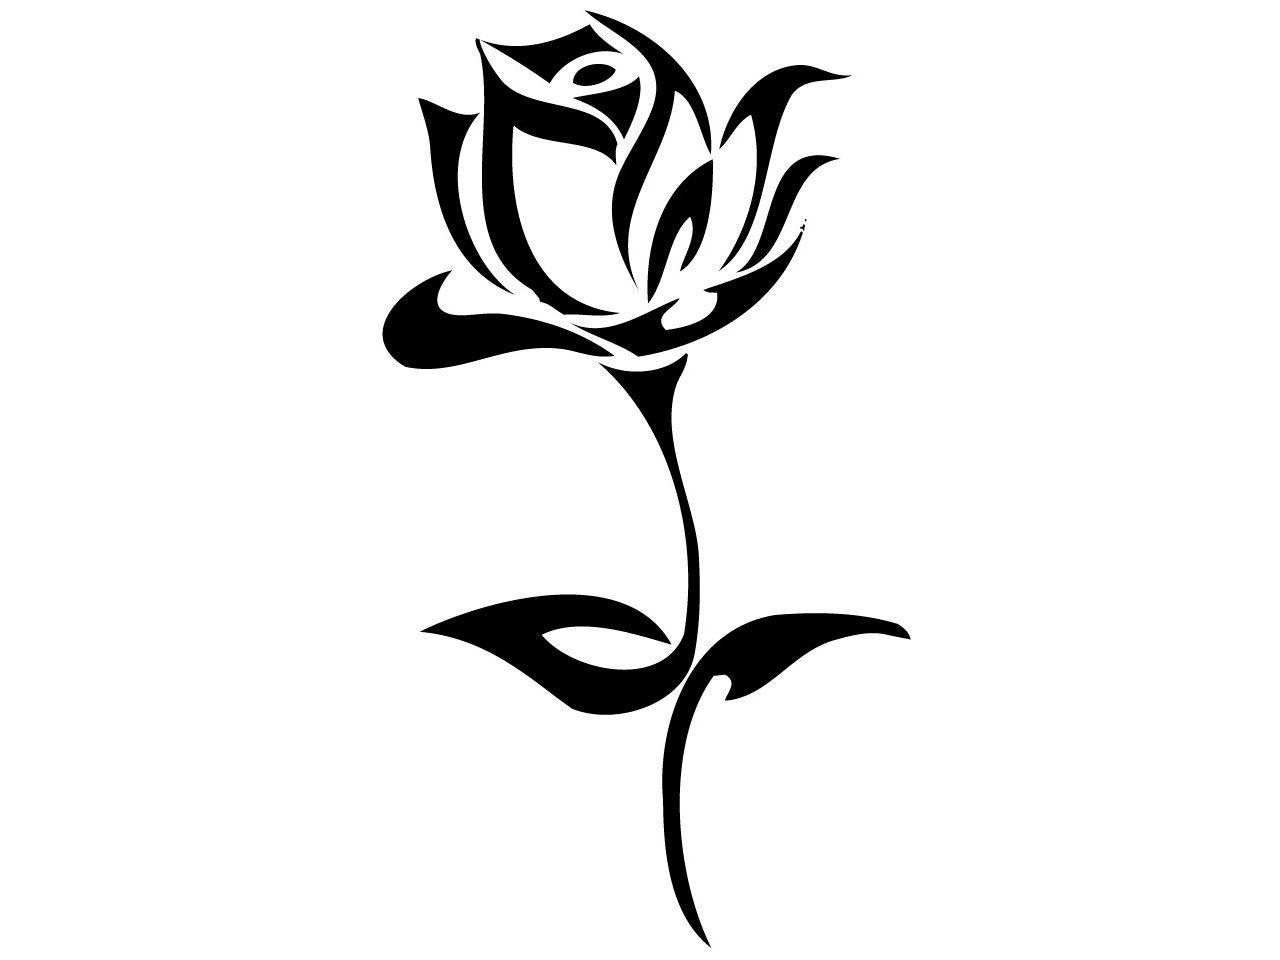 Simple Tribal Heart Tattoo | Tattoos Des-Simple Tribal Heart Tattoo | Tattoos Design Ideas - ClipArt Best - ClipArt  Best-7